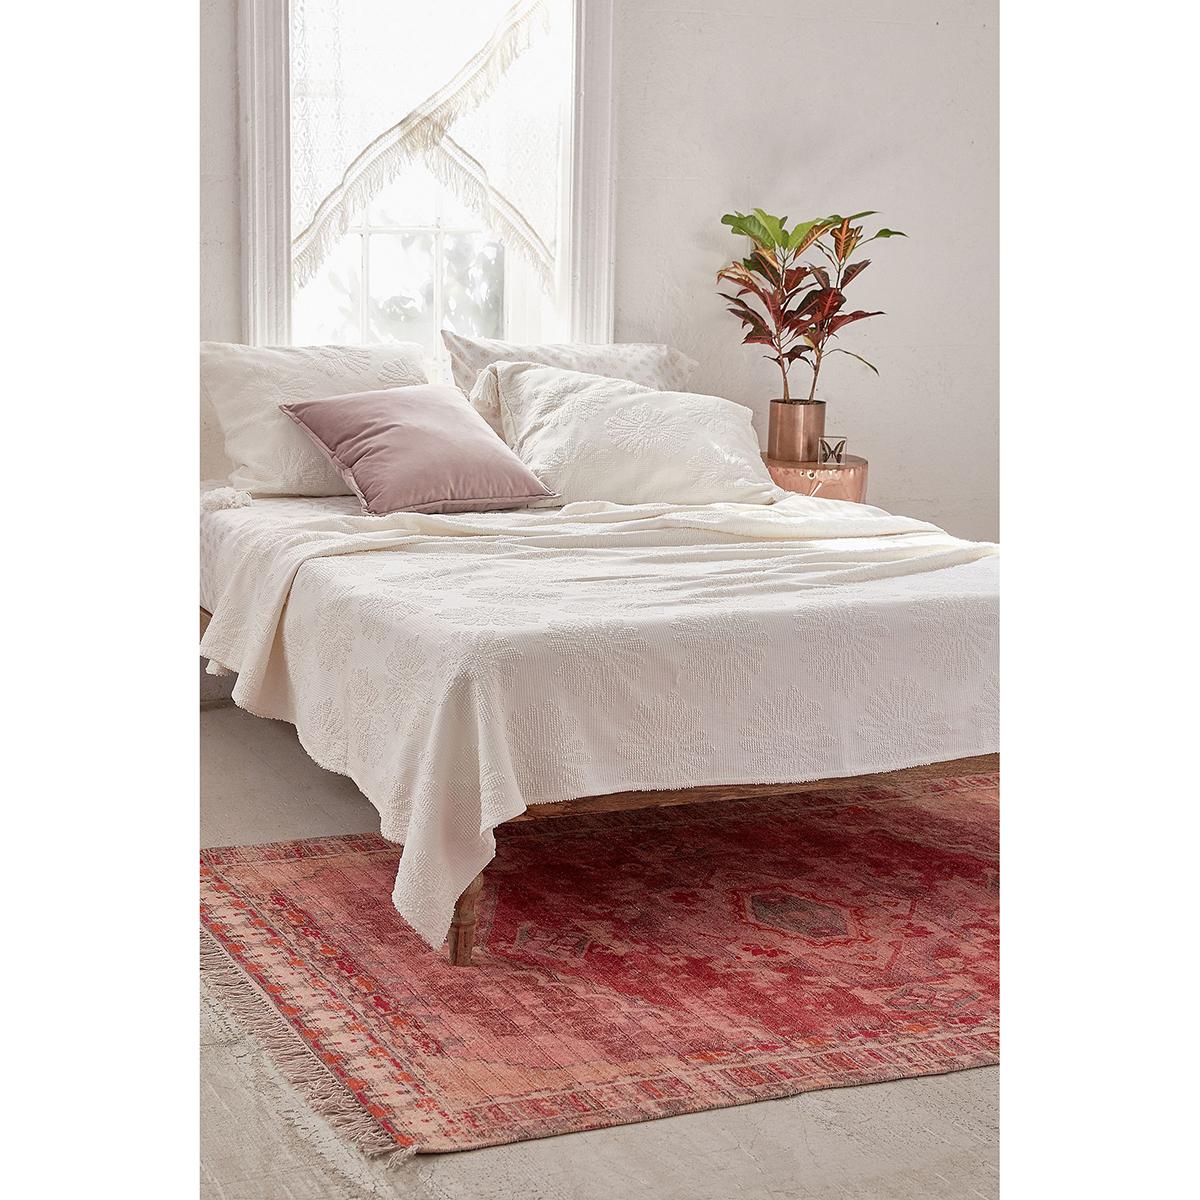 Best Boho Home Décor: Eclectic, Chic, Bohemian Furniture